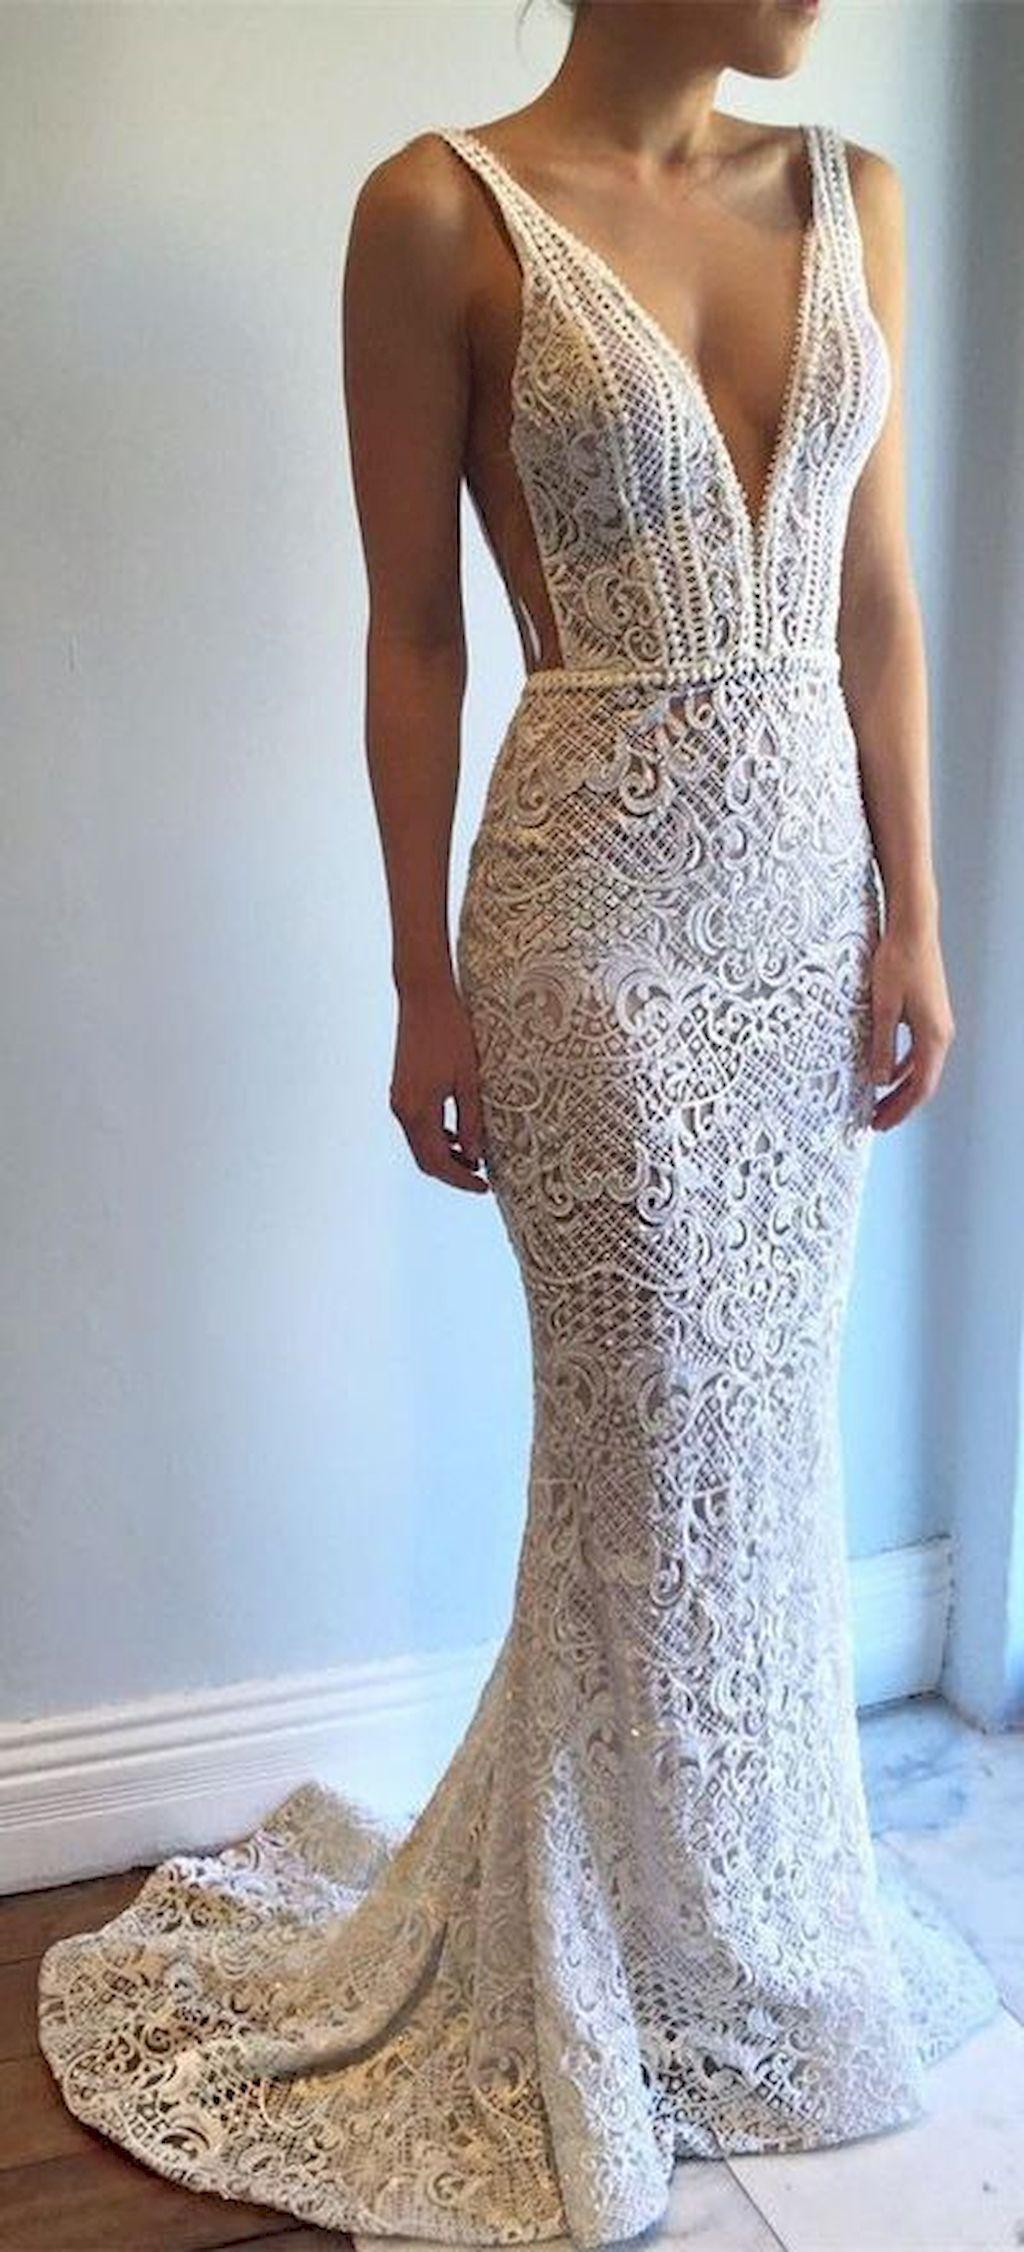 gorgeous backless wedding dresses design ideas vow renewal